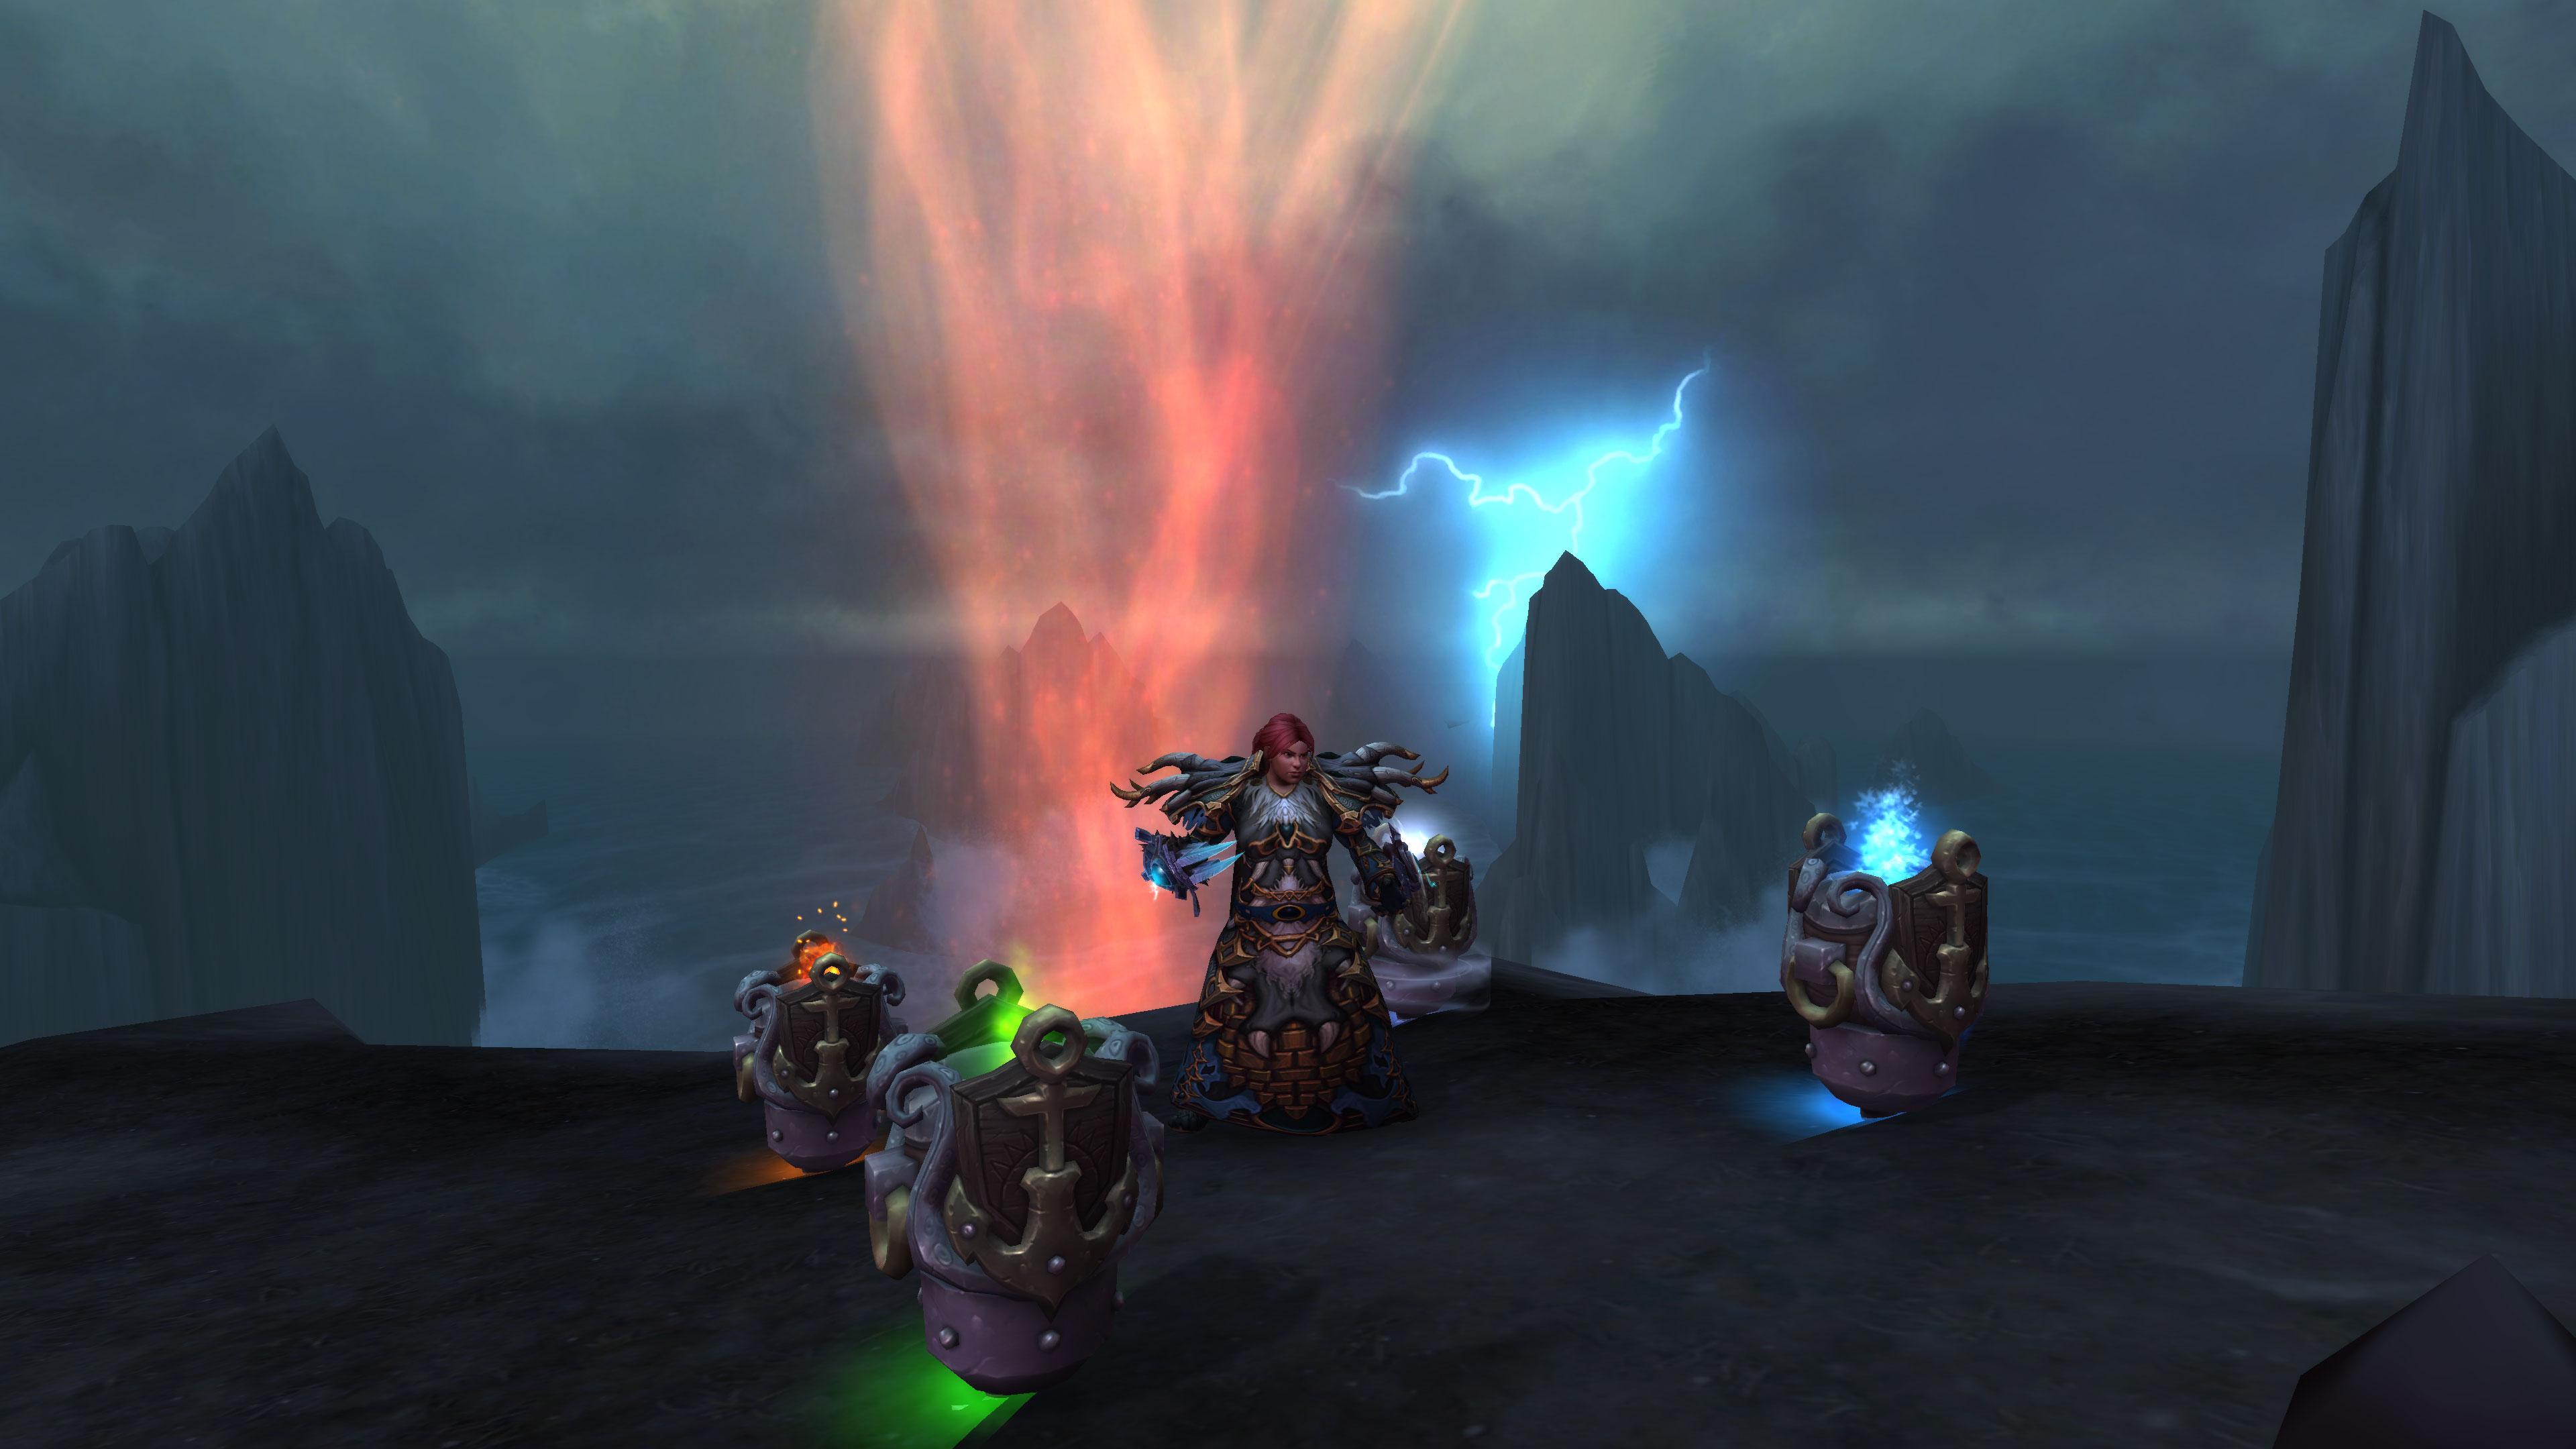 Kul'Tiran shaman with totems